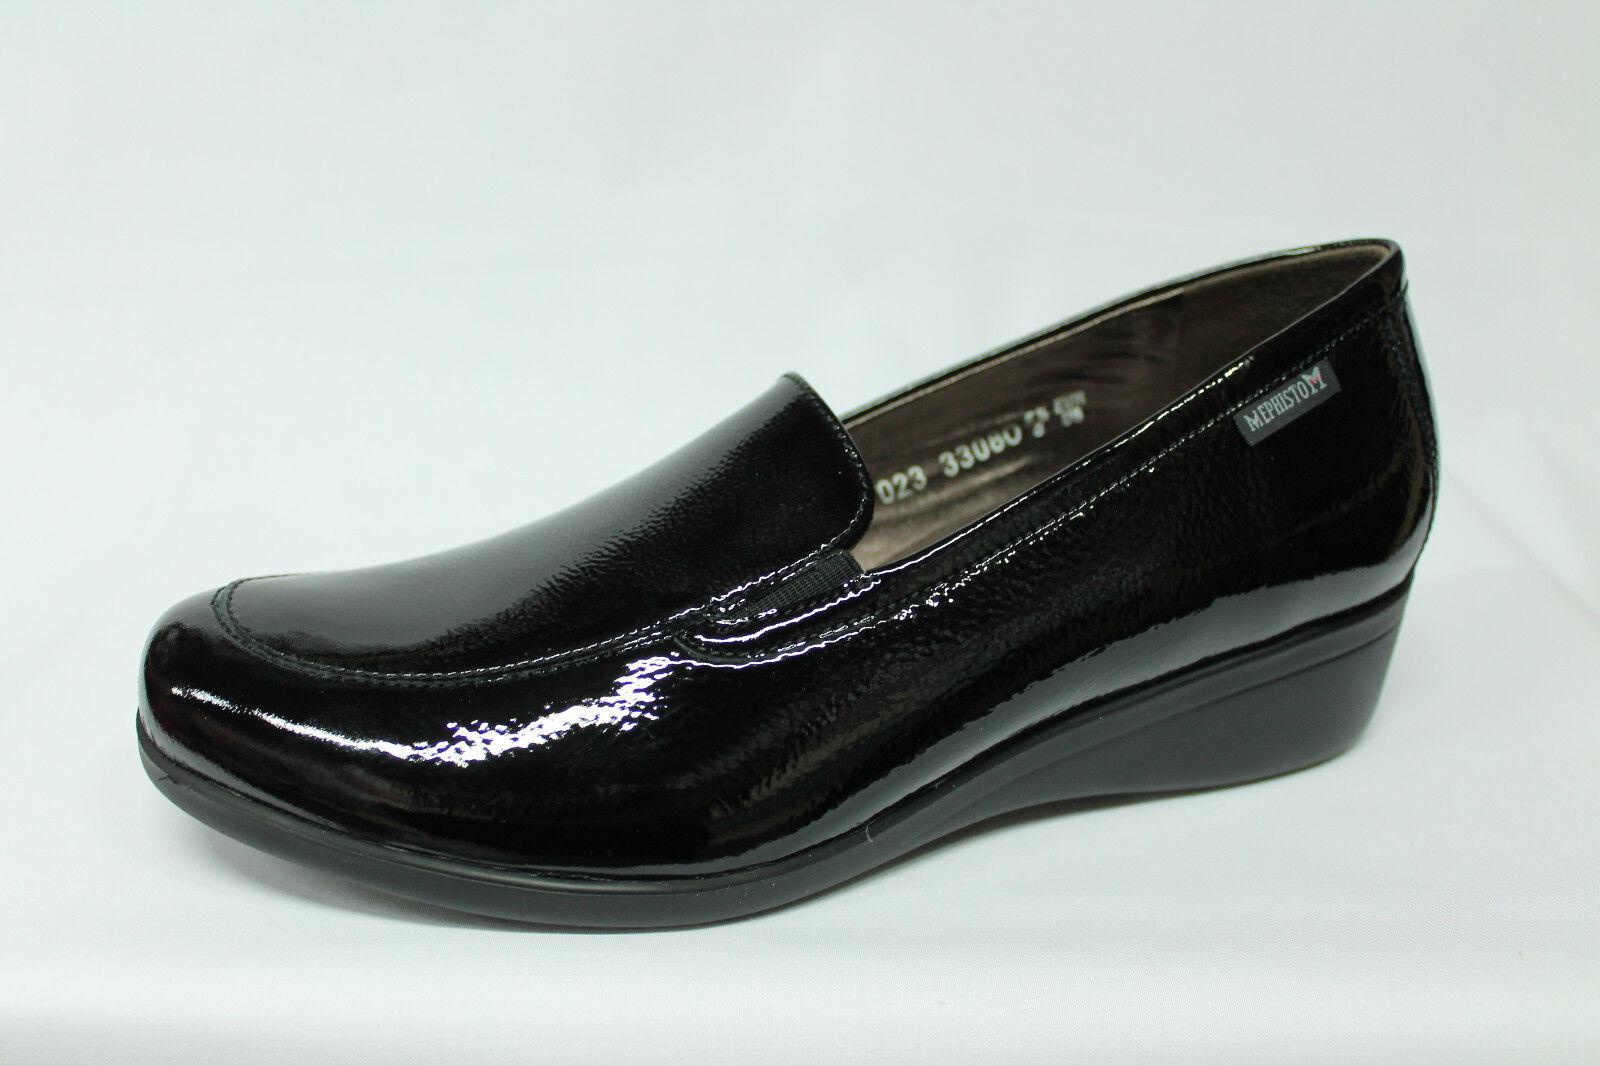 Mocassini Mephisto Olivia vernice nera listino 169 - 20%   Moderno Ed Elegante Nella Moda    Scolaro/Signora Scarpa